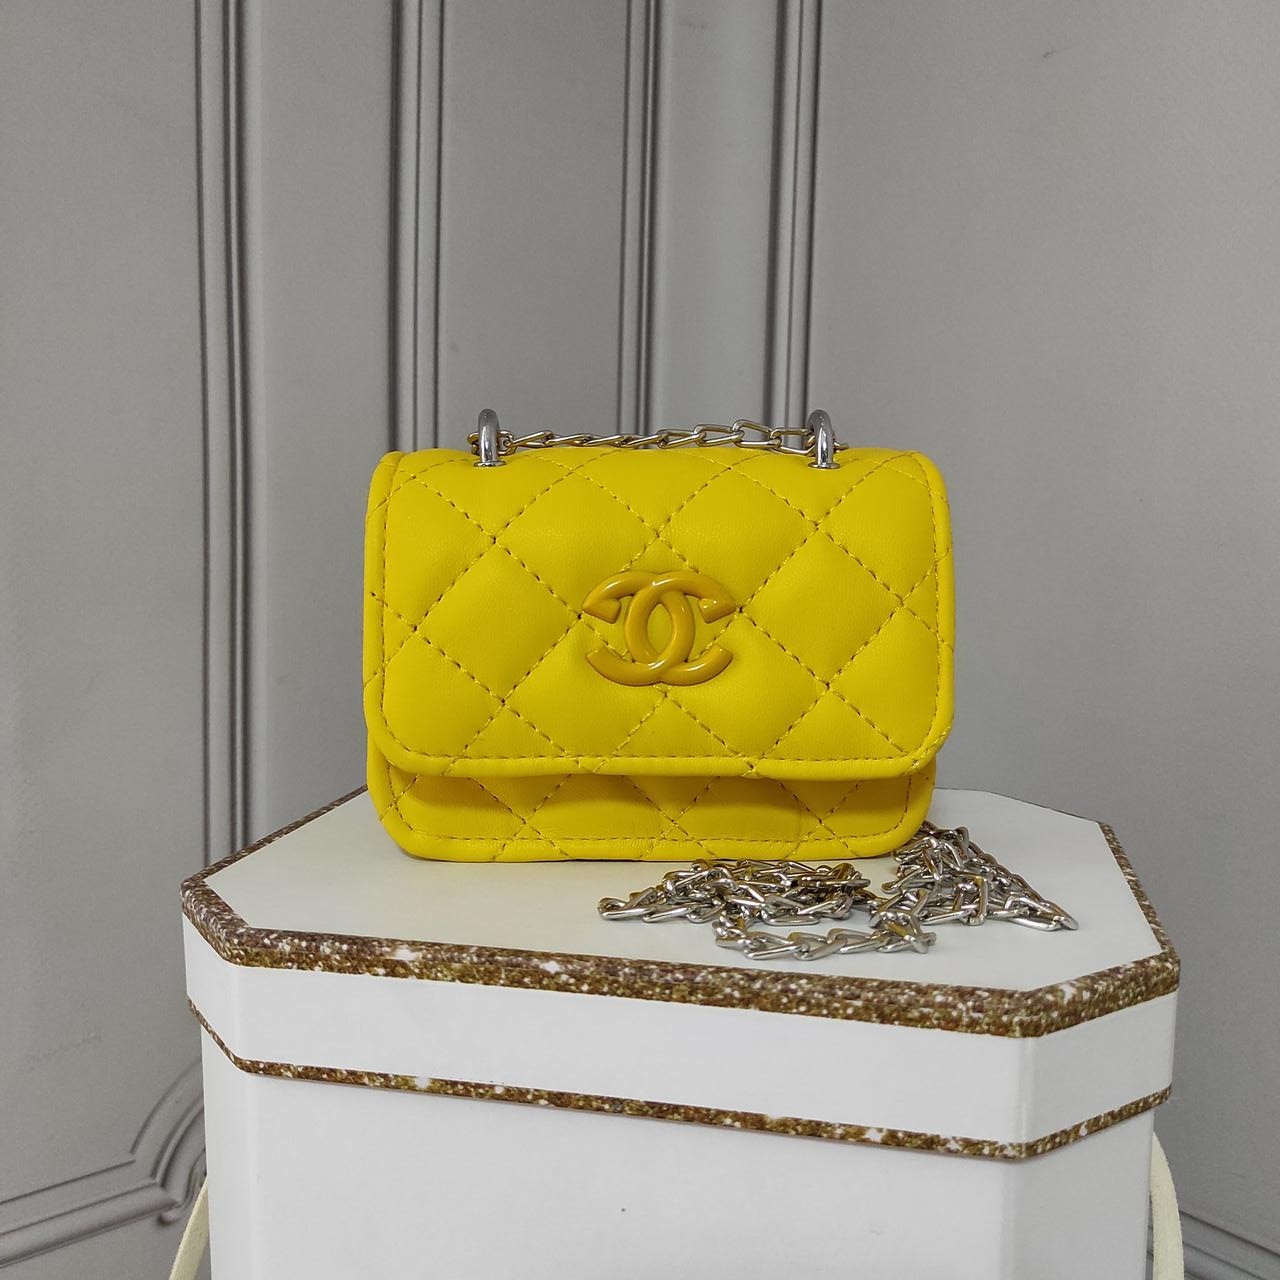 Мини кросс боди, желтая сумка Chanel